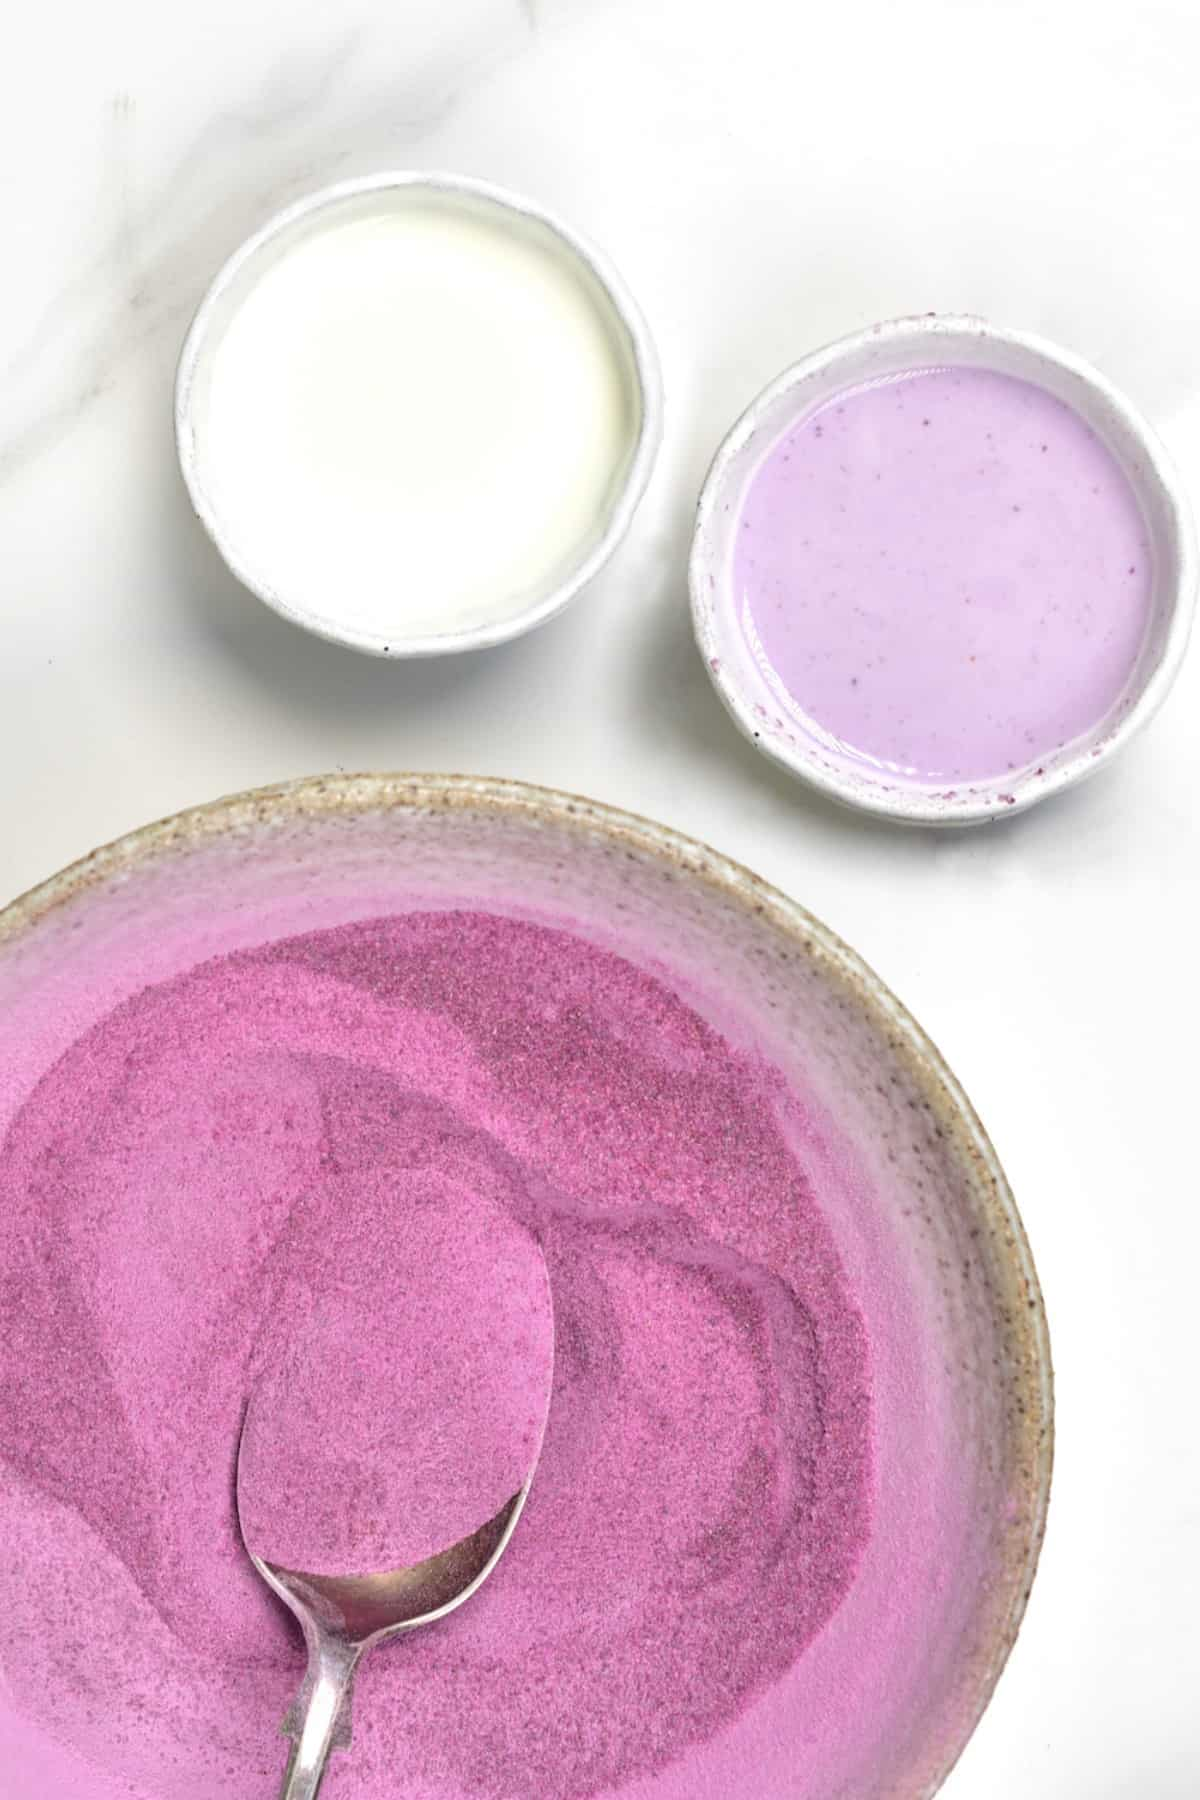 Using purple potato powder